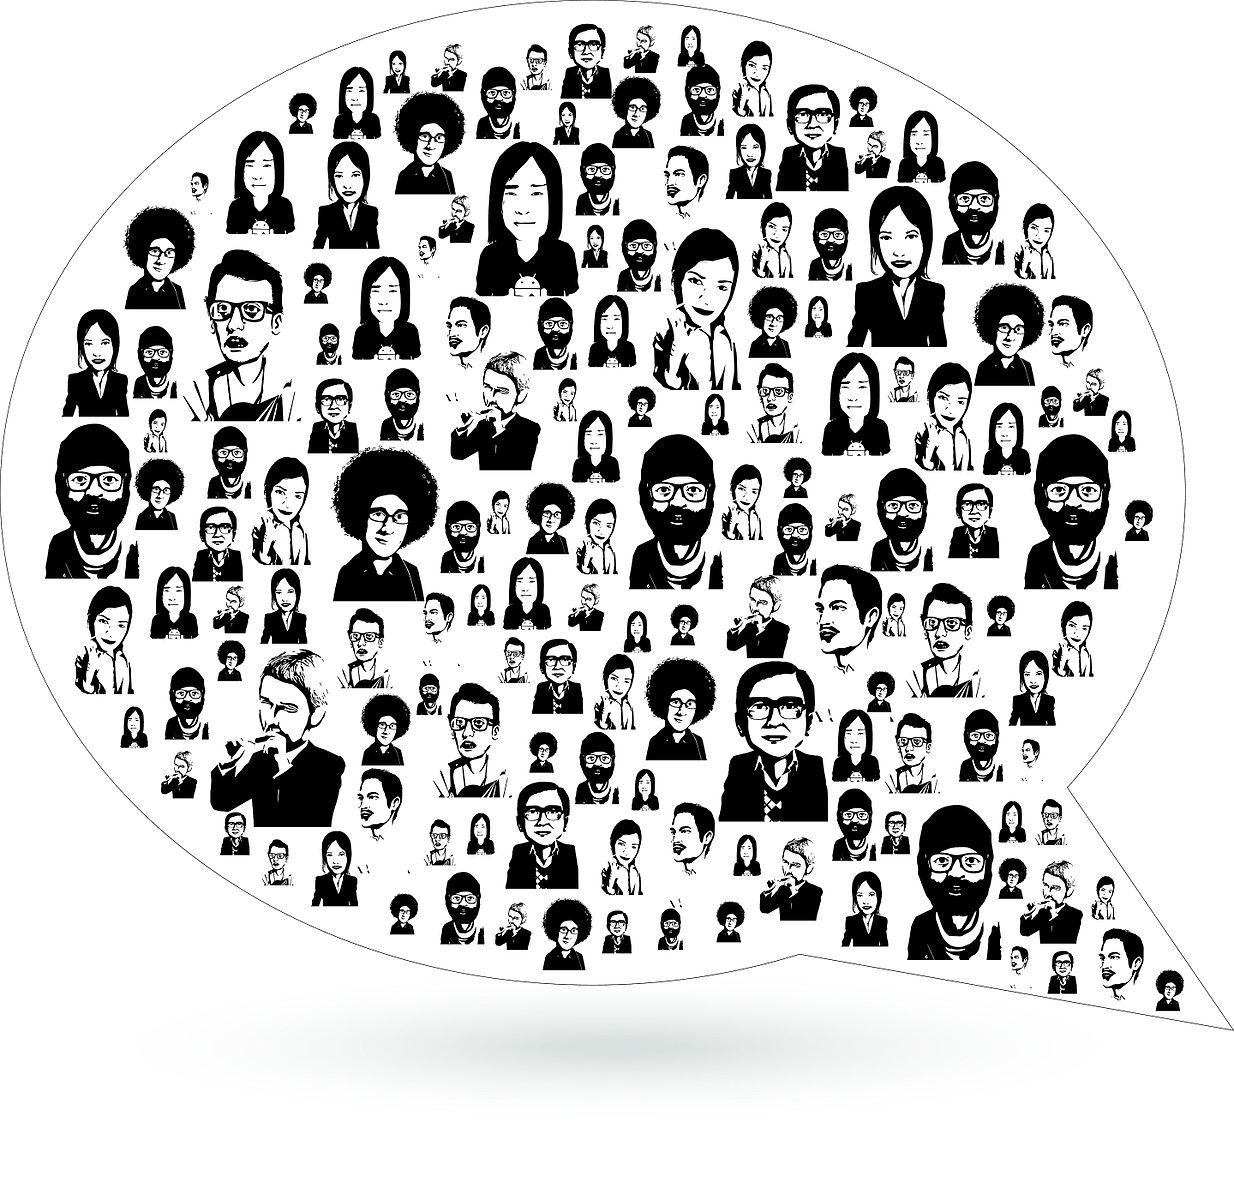 Crowdtesting.jpg